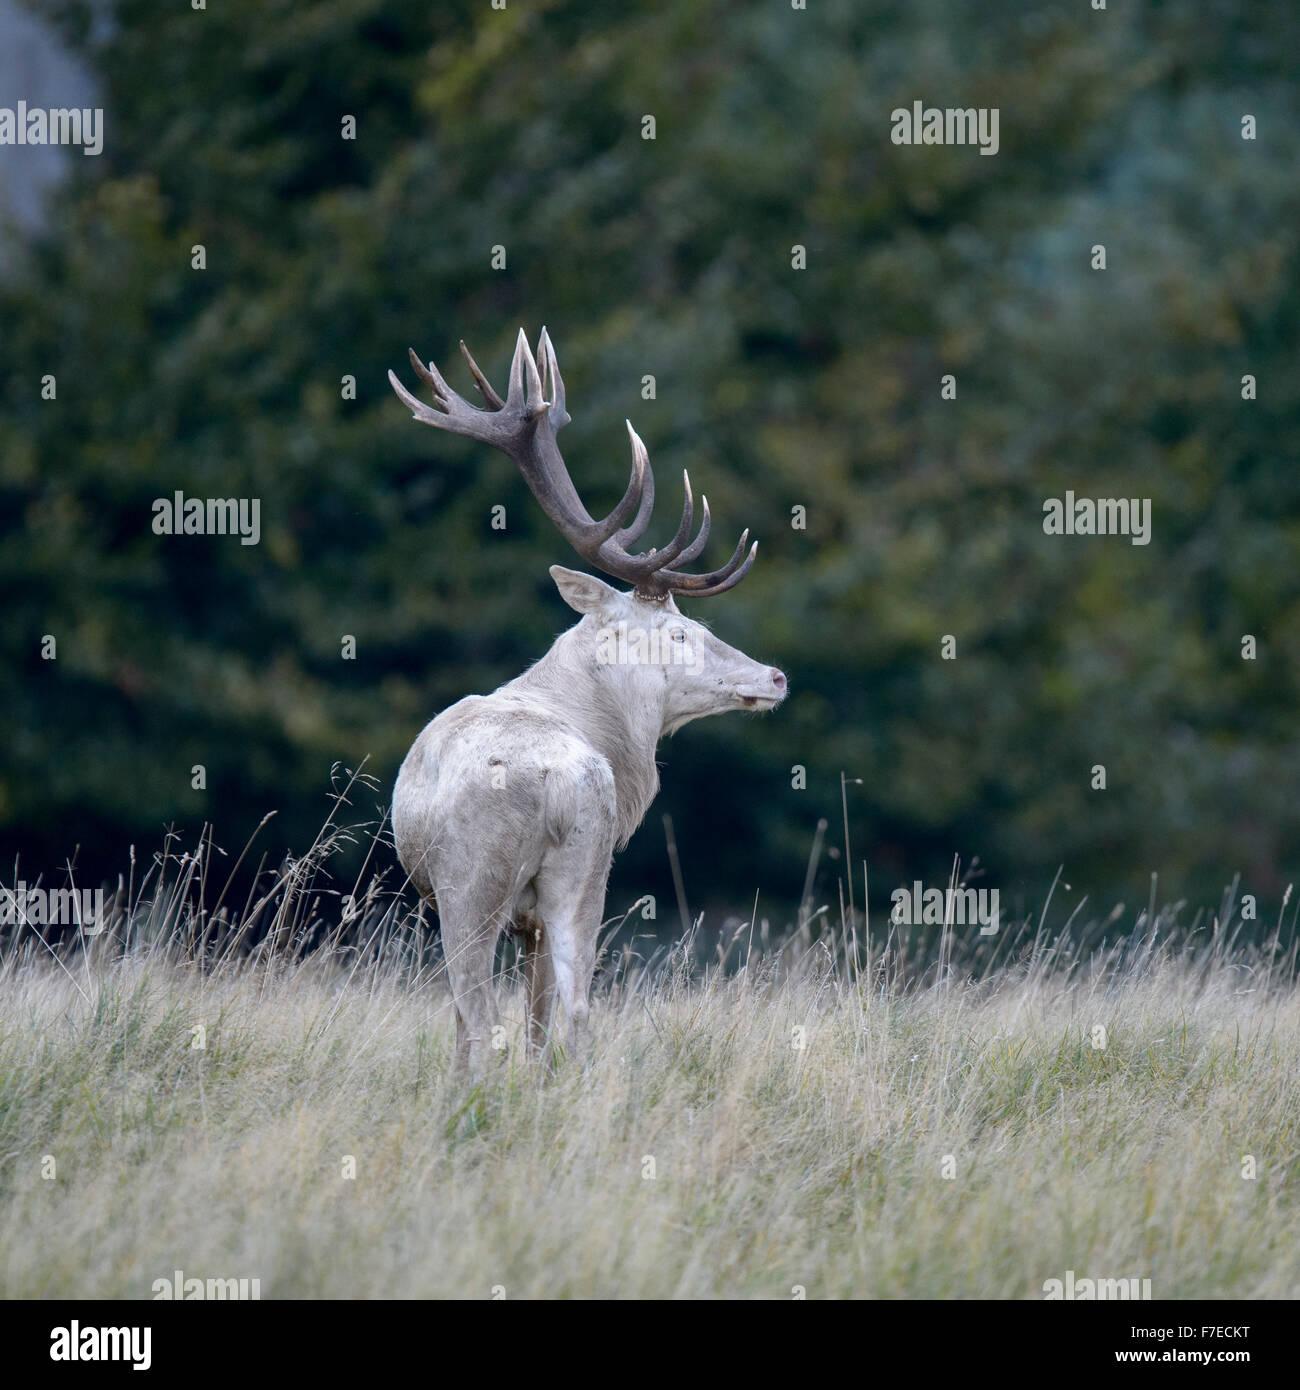 Red deer (Cervus elaphus), white morph on forest meadow, Zealand, Denmark - Stock Image